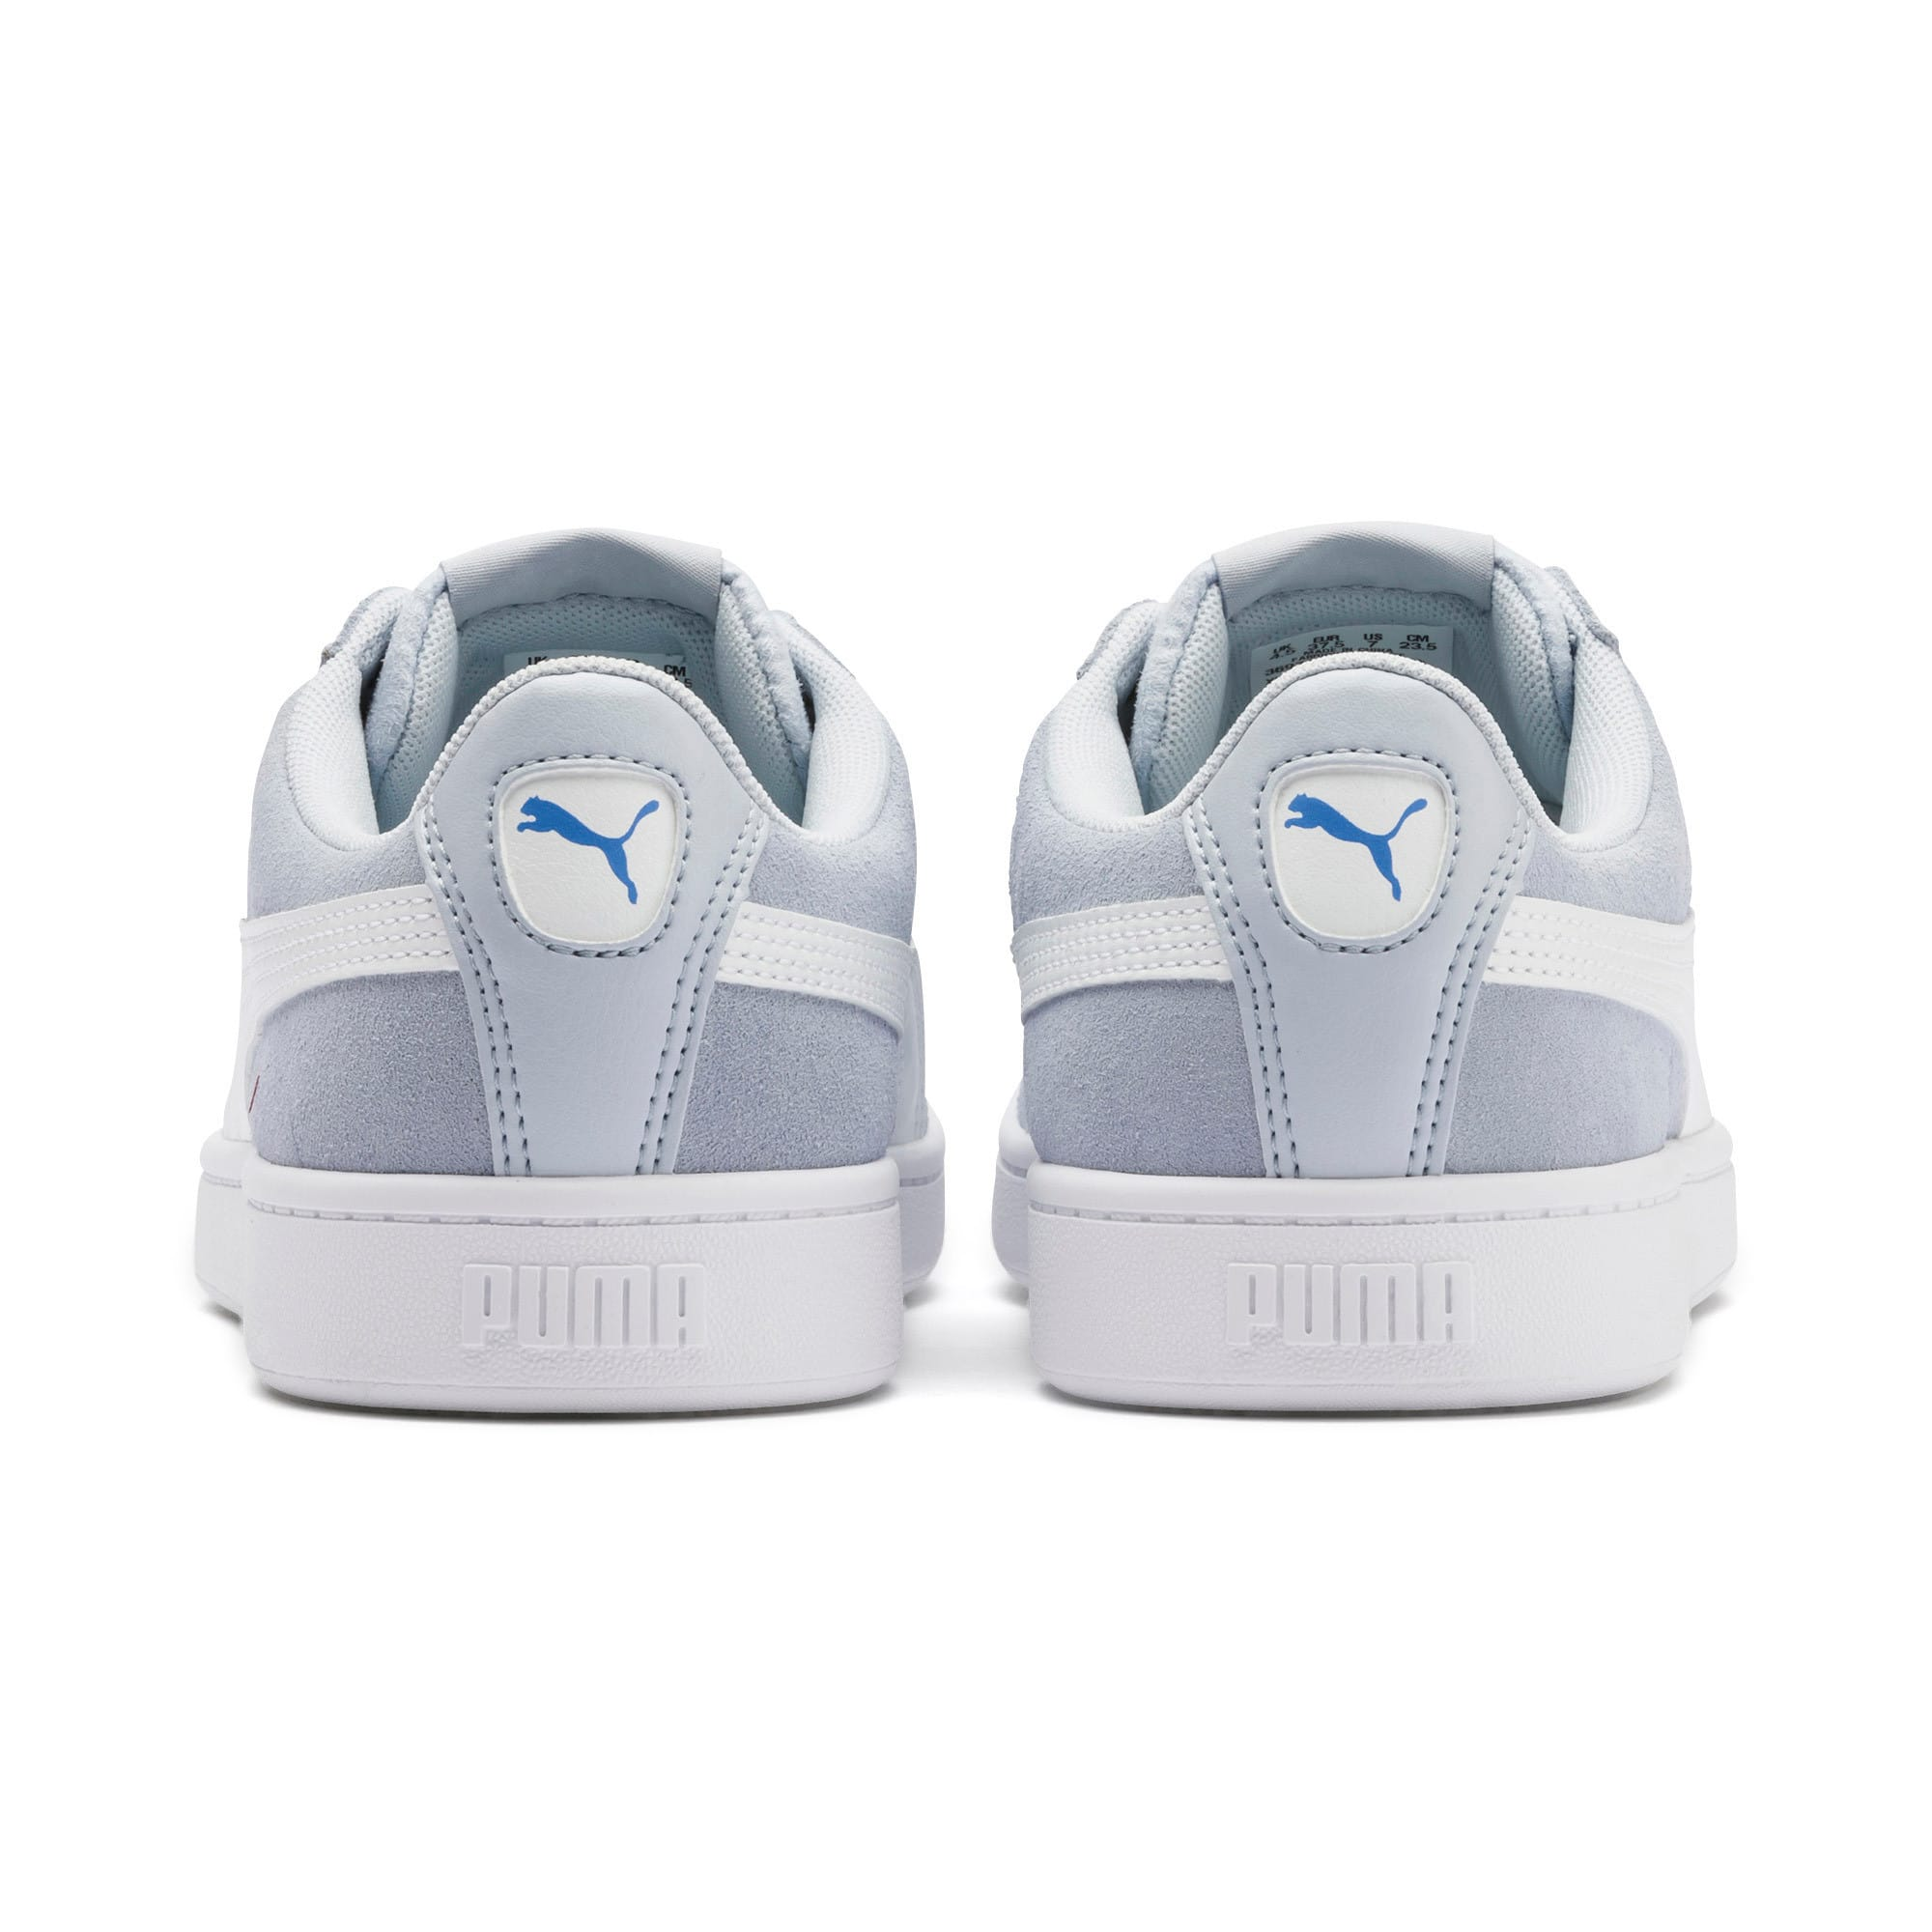 Thumbnail 4 of PUMA Vikky v2 Women's Sneakers, Heather-Ultramarine-White, medium